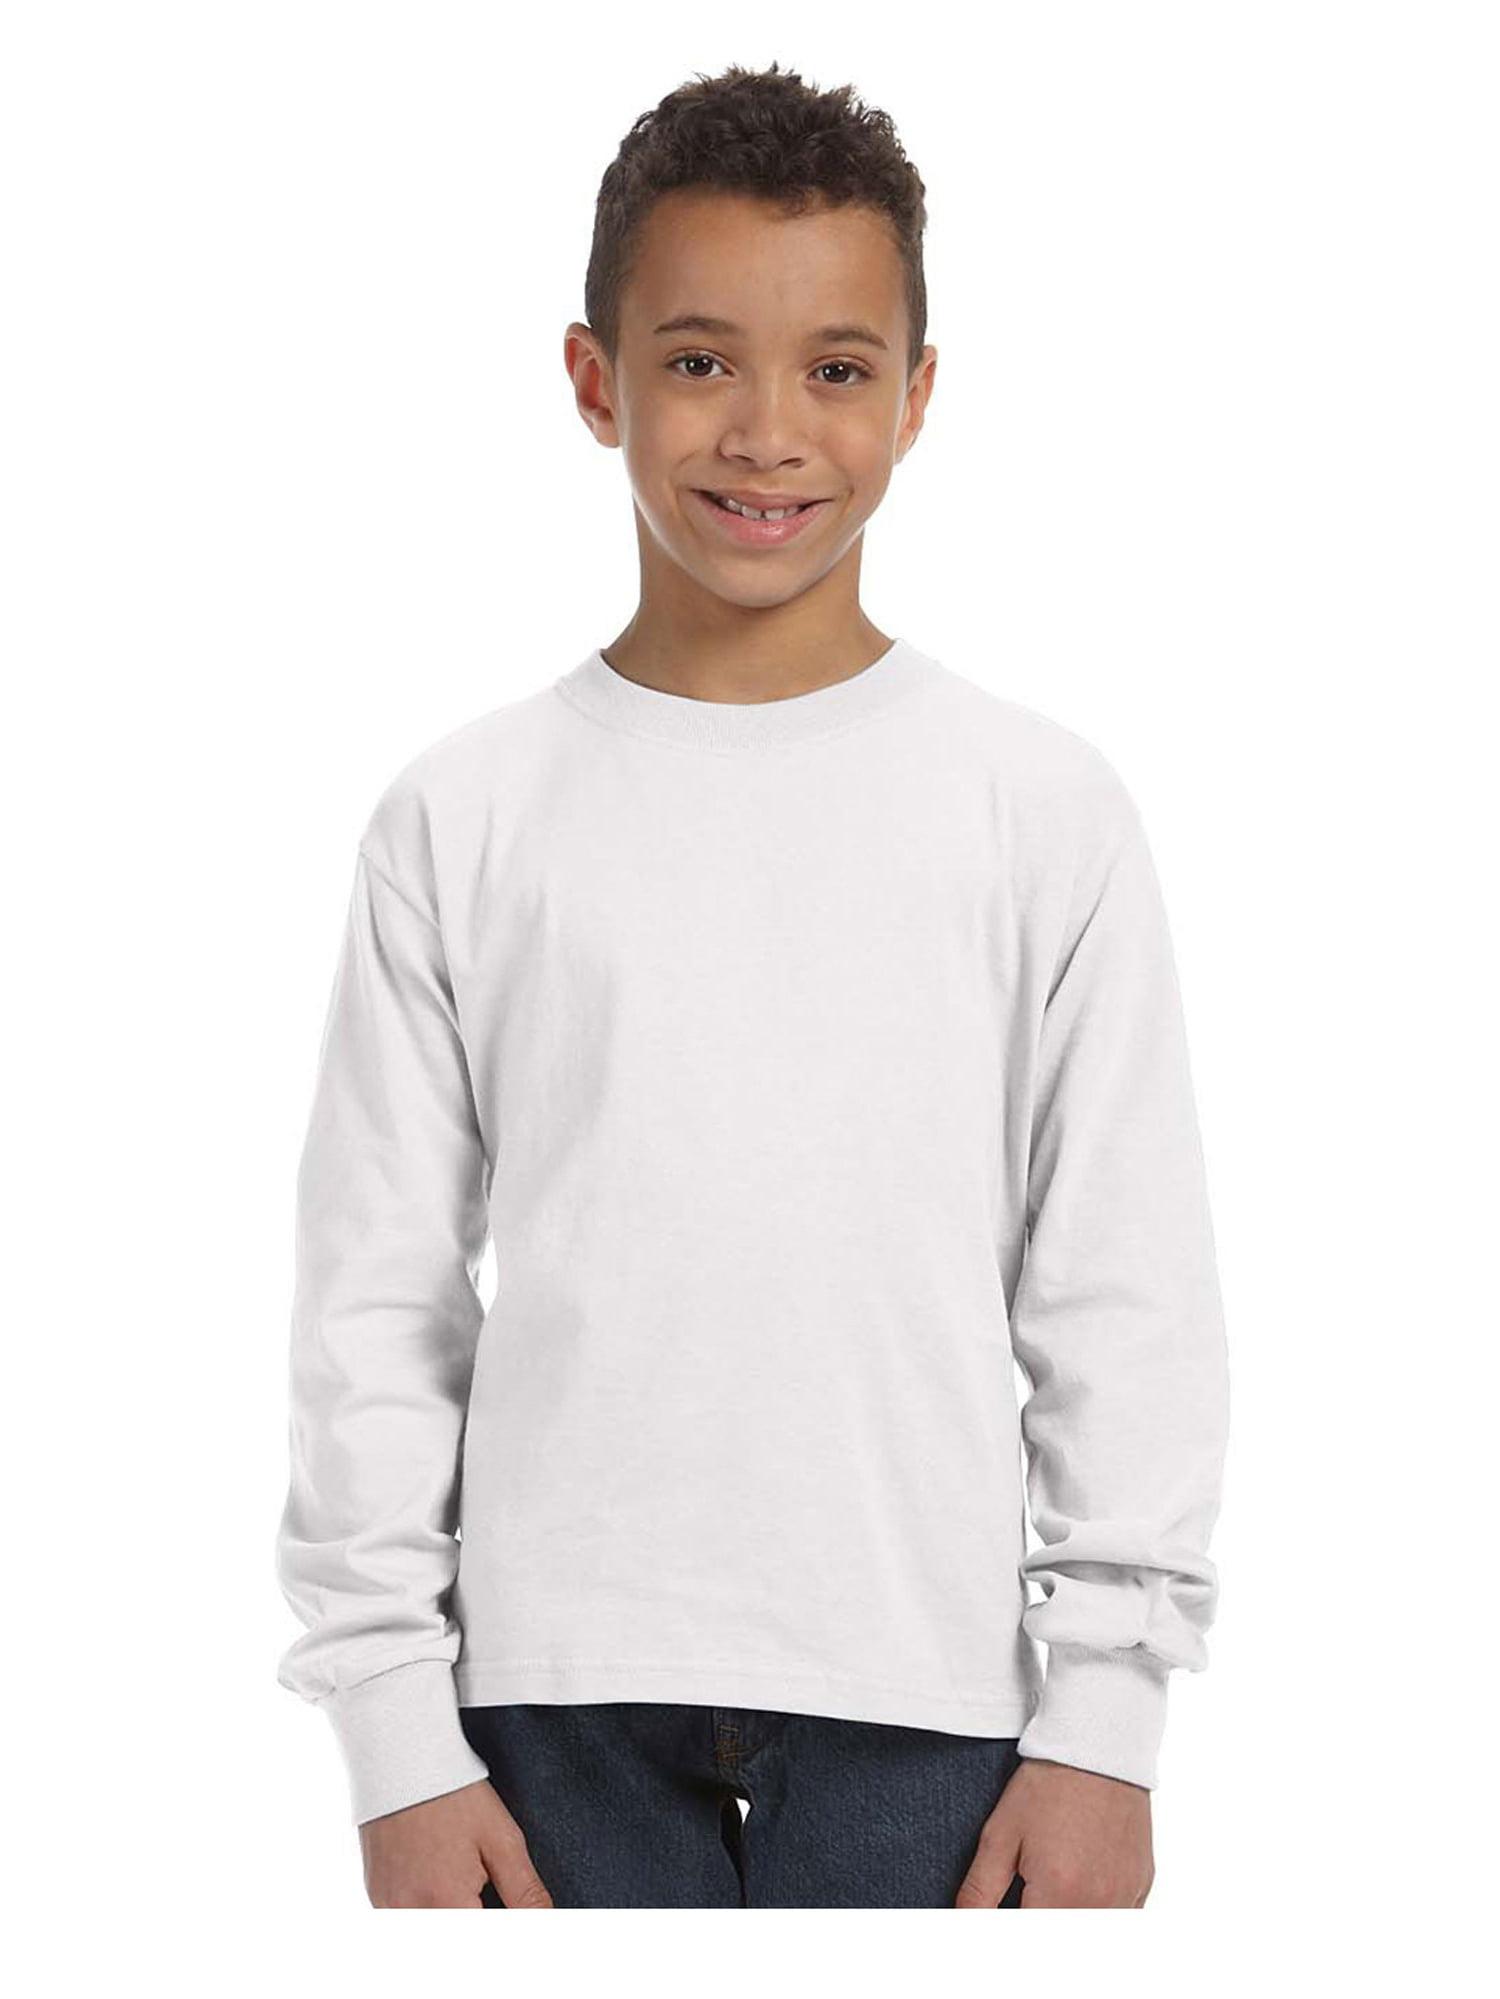 Fruit of the Loom Big Boy's Crewneck T-Shirt, Style 4930B